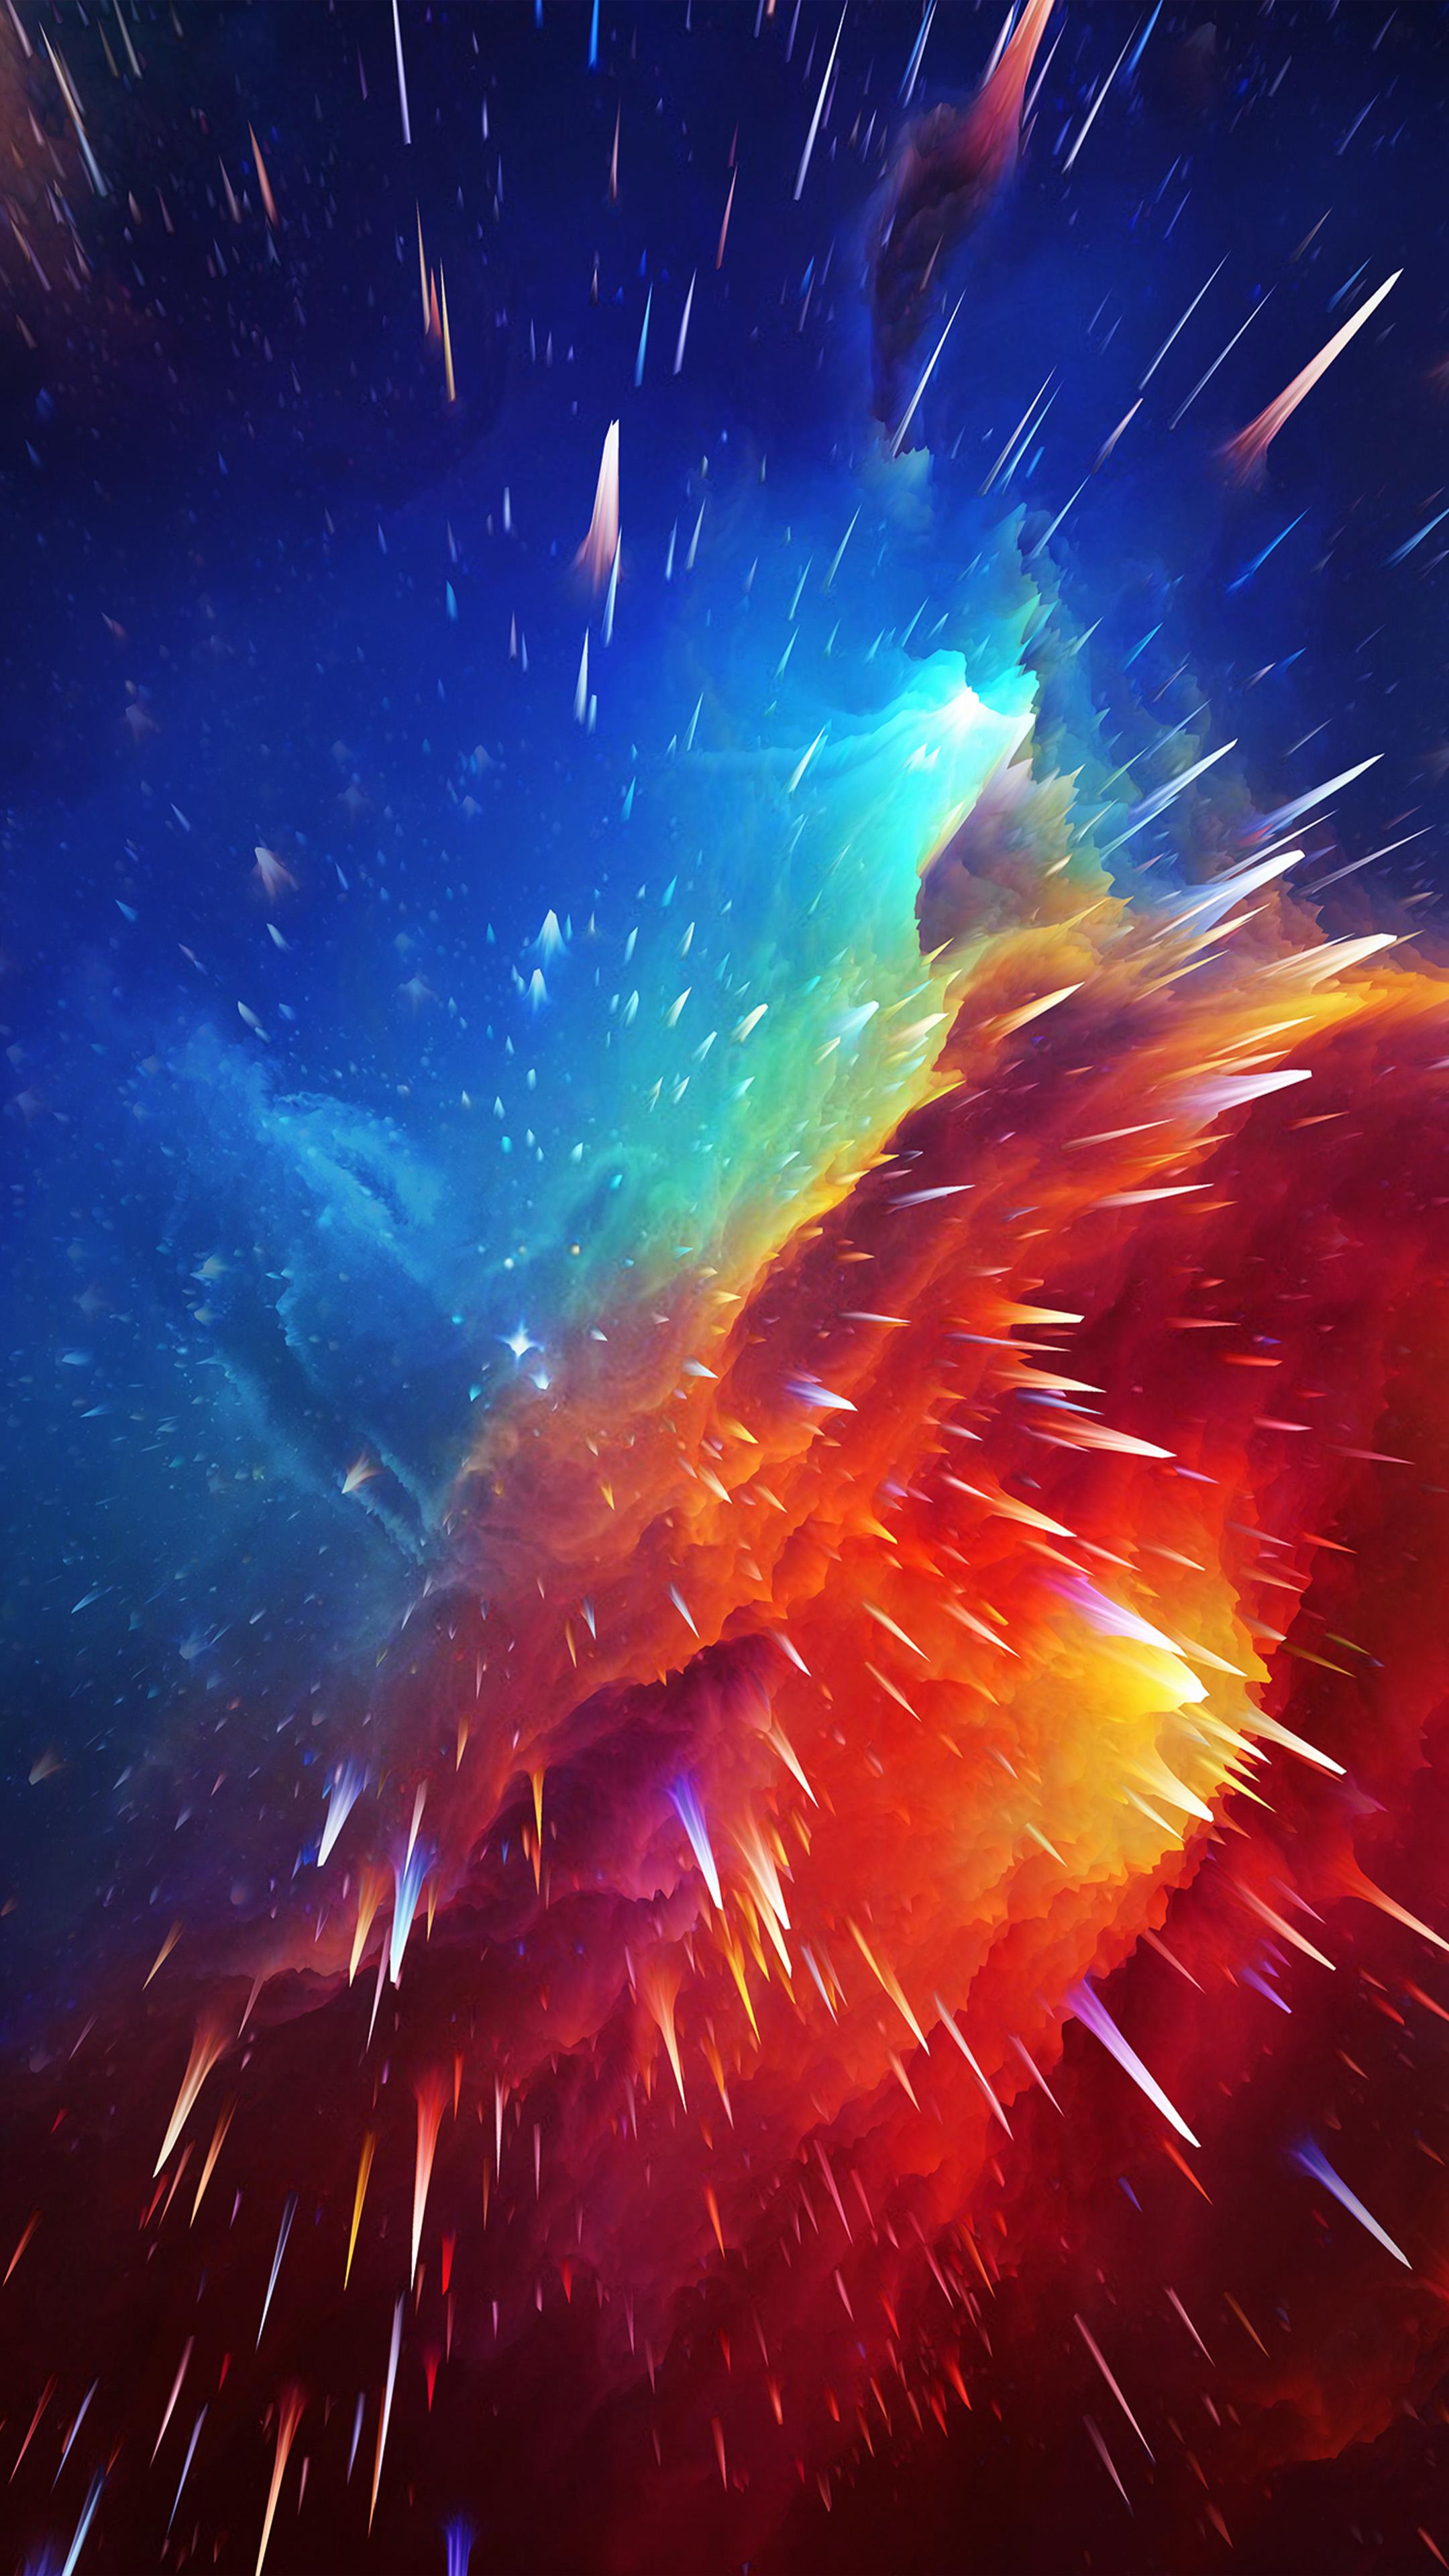 Nebula Waves 4K & Ultra HD Mobile Wallpaper - Download ...